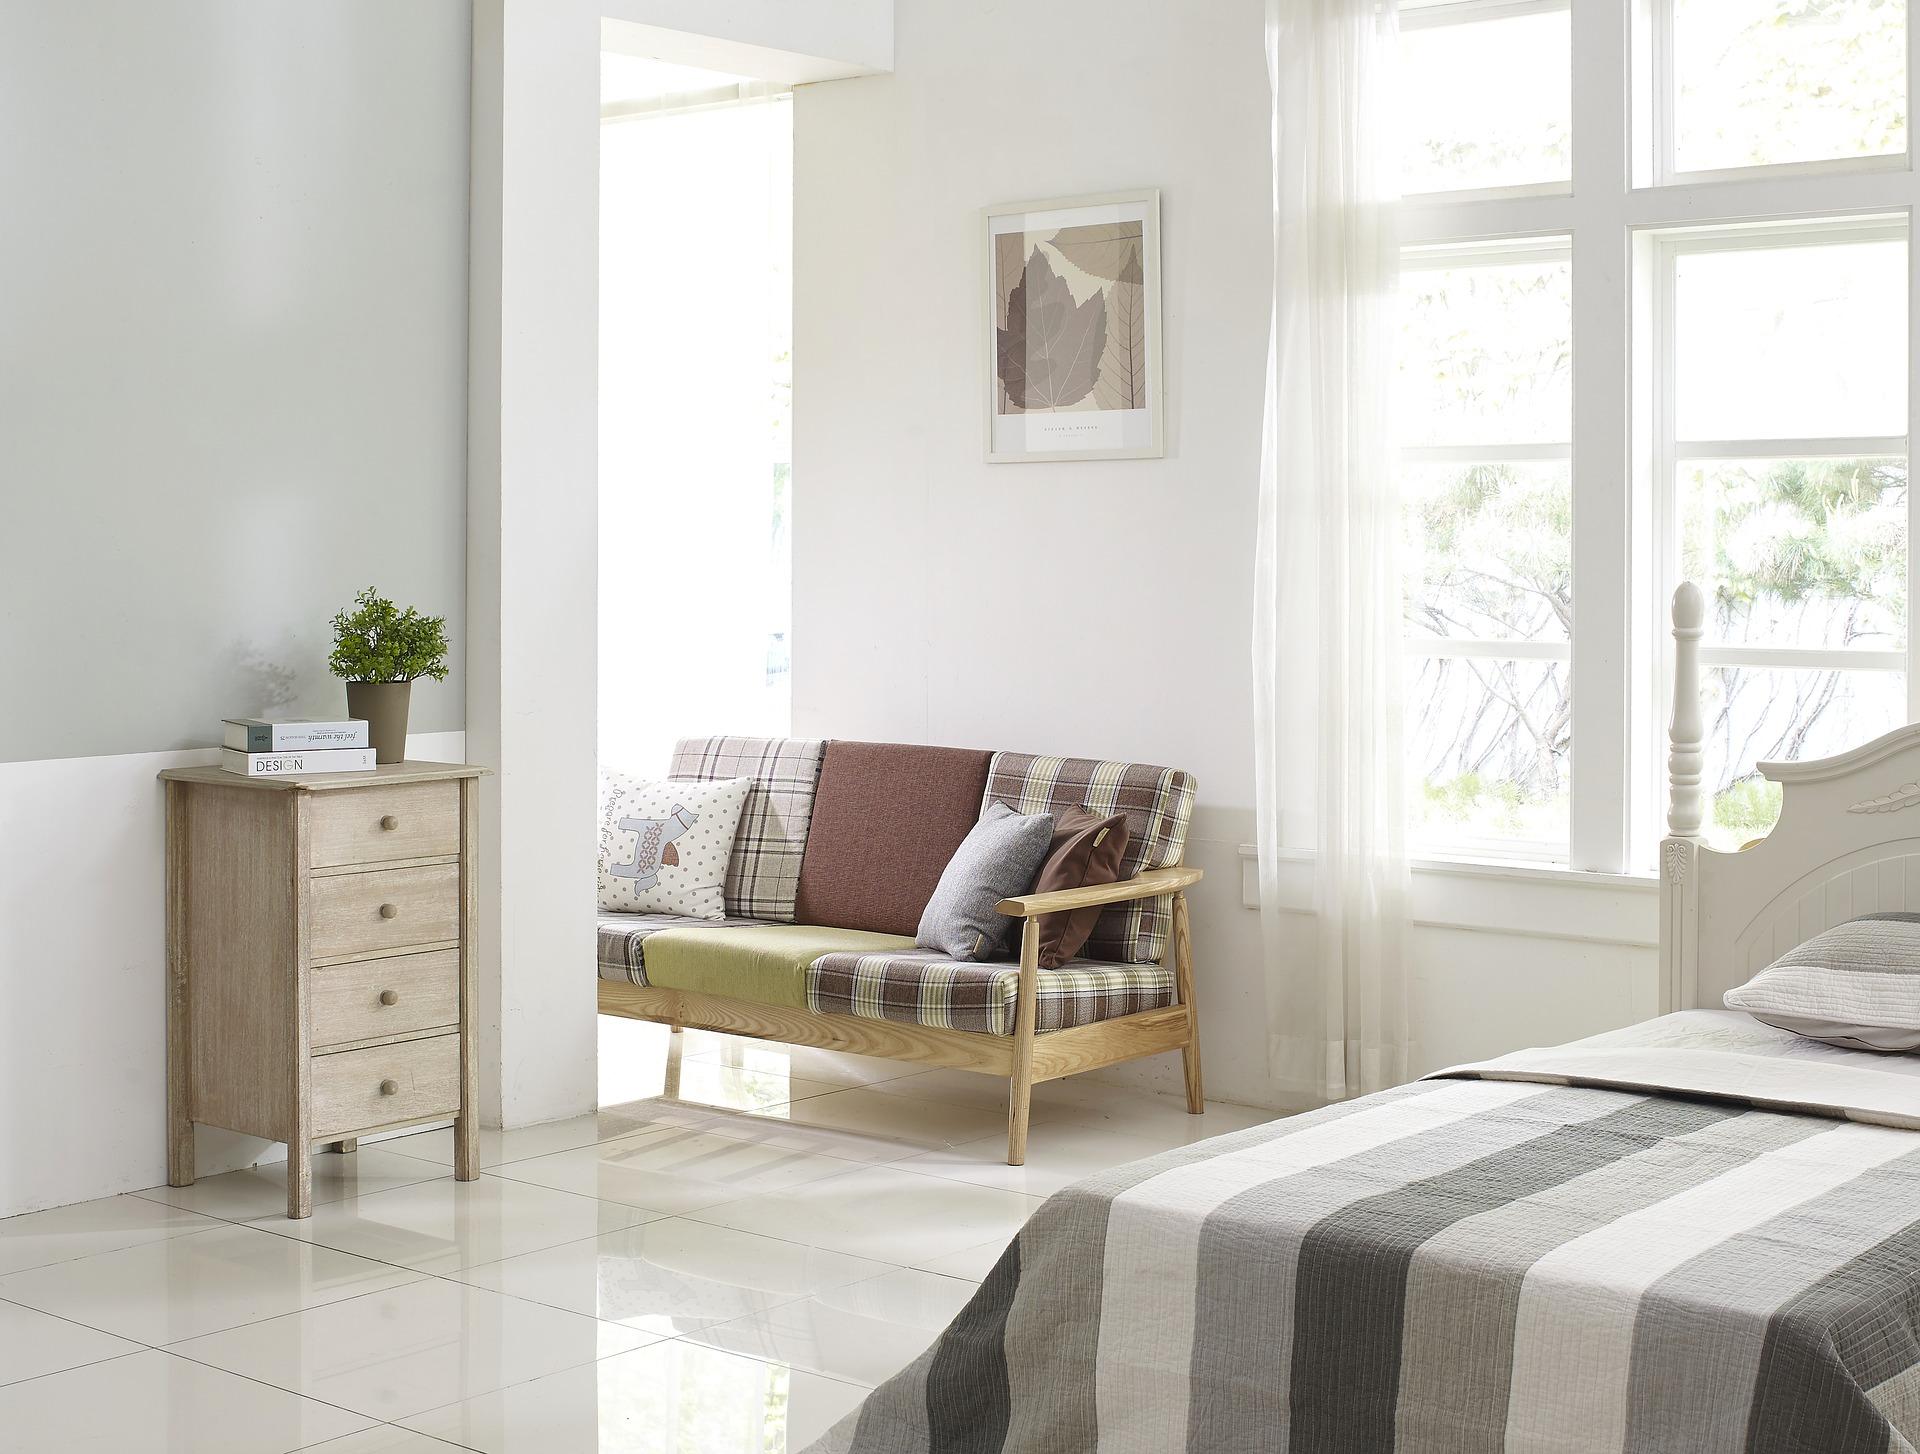 feng shui farben f r zimmer wie sollte man zimmer gestalten. Black Bedroom Furniture Sets. Home Design Ideas